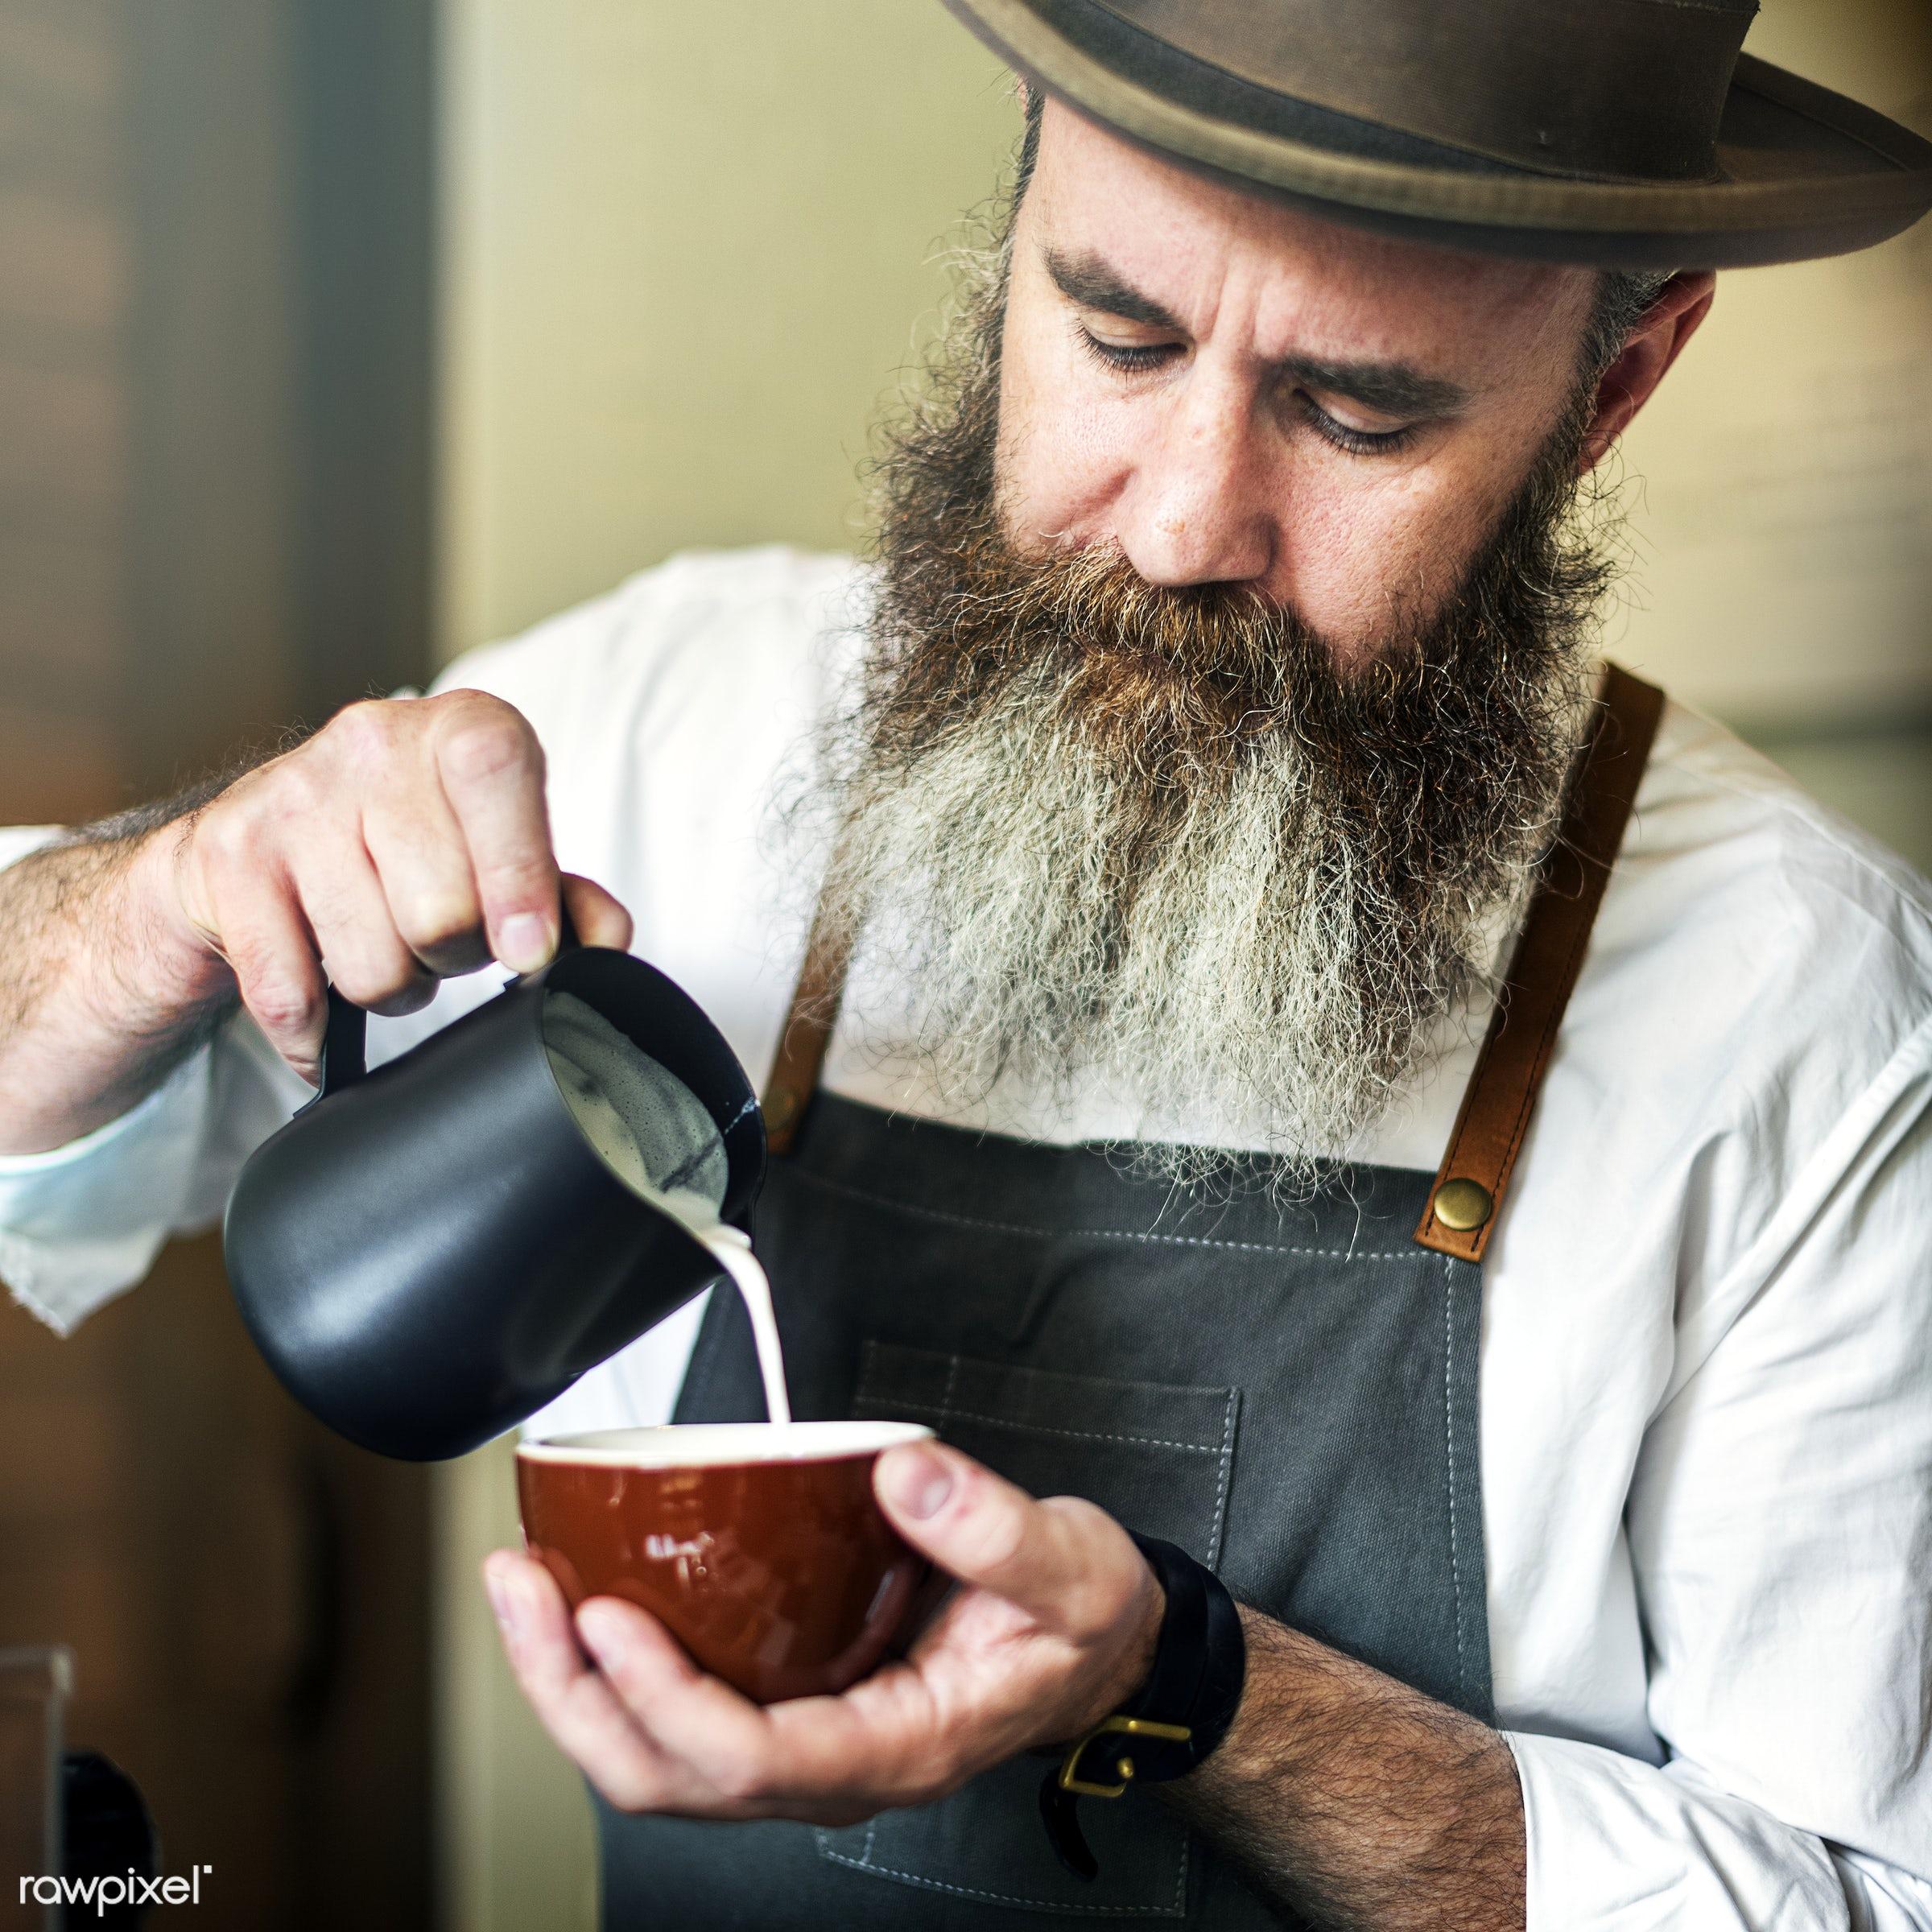 Male barista preparing a cup of coffee - coffee, cafe, restaurant, milk, latte, counter, bar, waiter, apron, barista,...